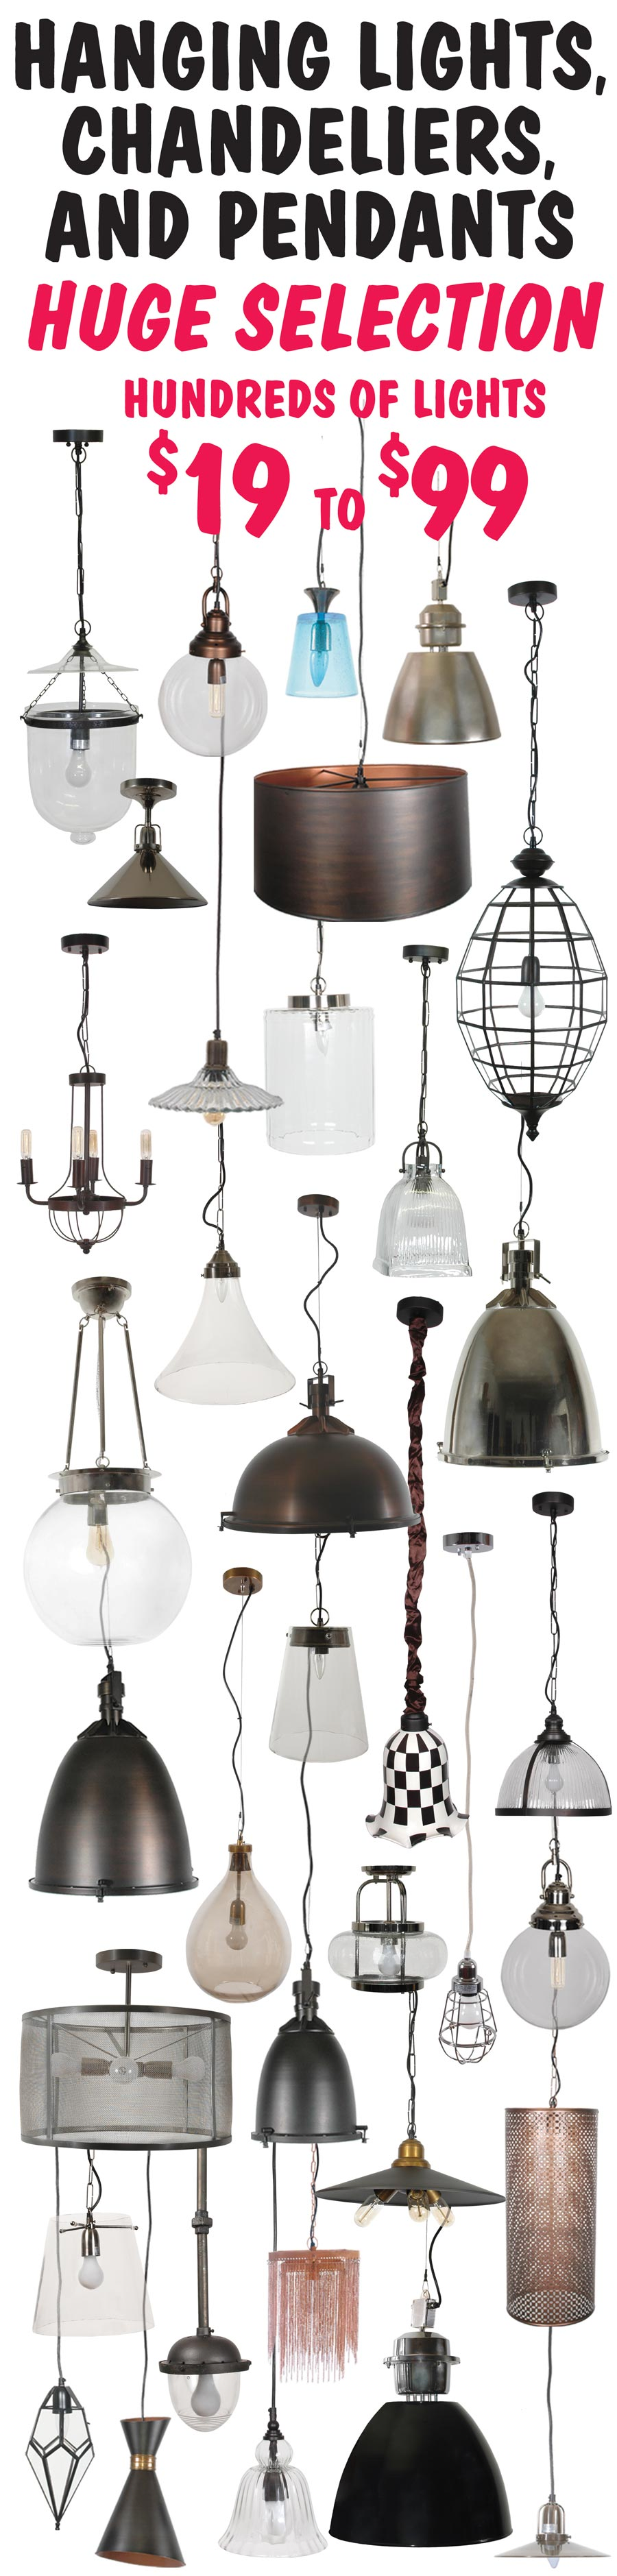 Hanging Lights, Chandeliers, and Pendants